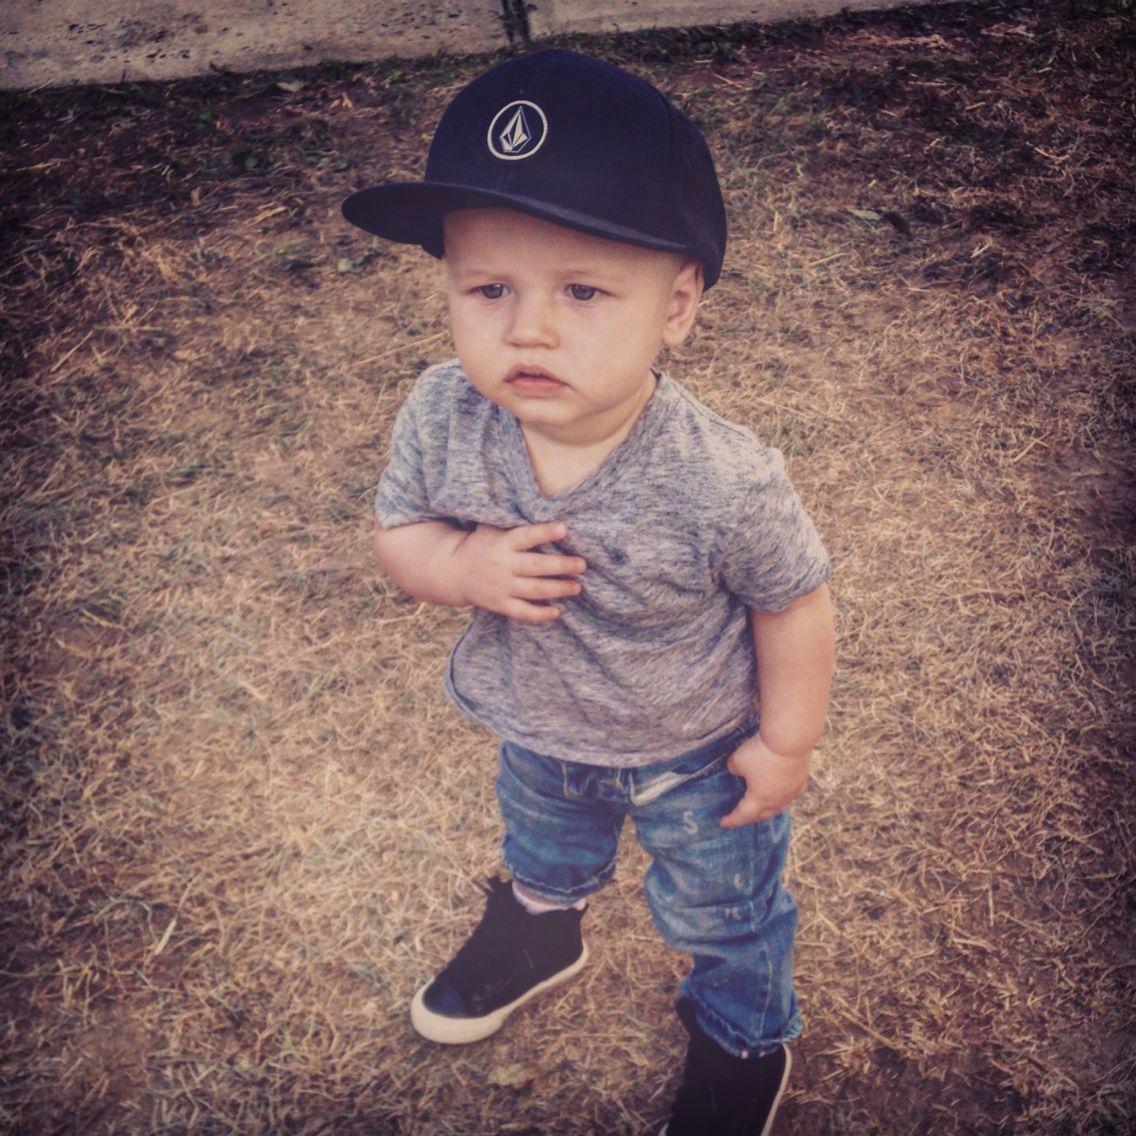 d85b8f43c volcom skate baby hat. baby gap jeans, baby gap sneakers, baby gap ...